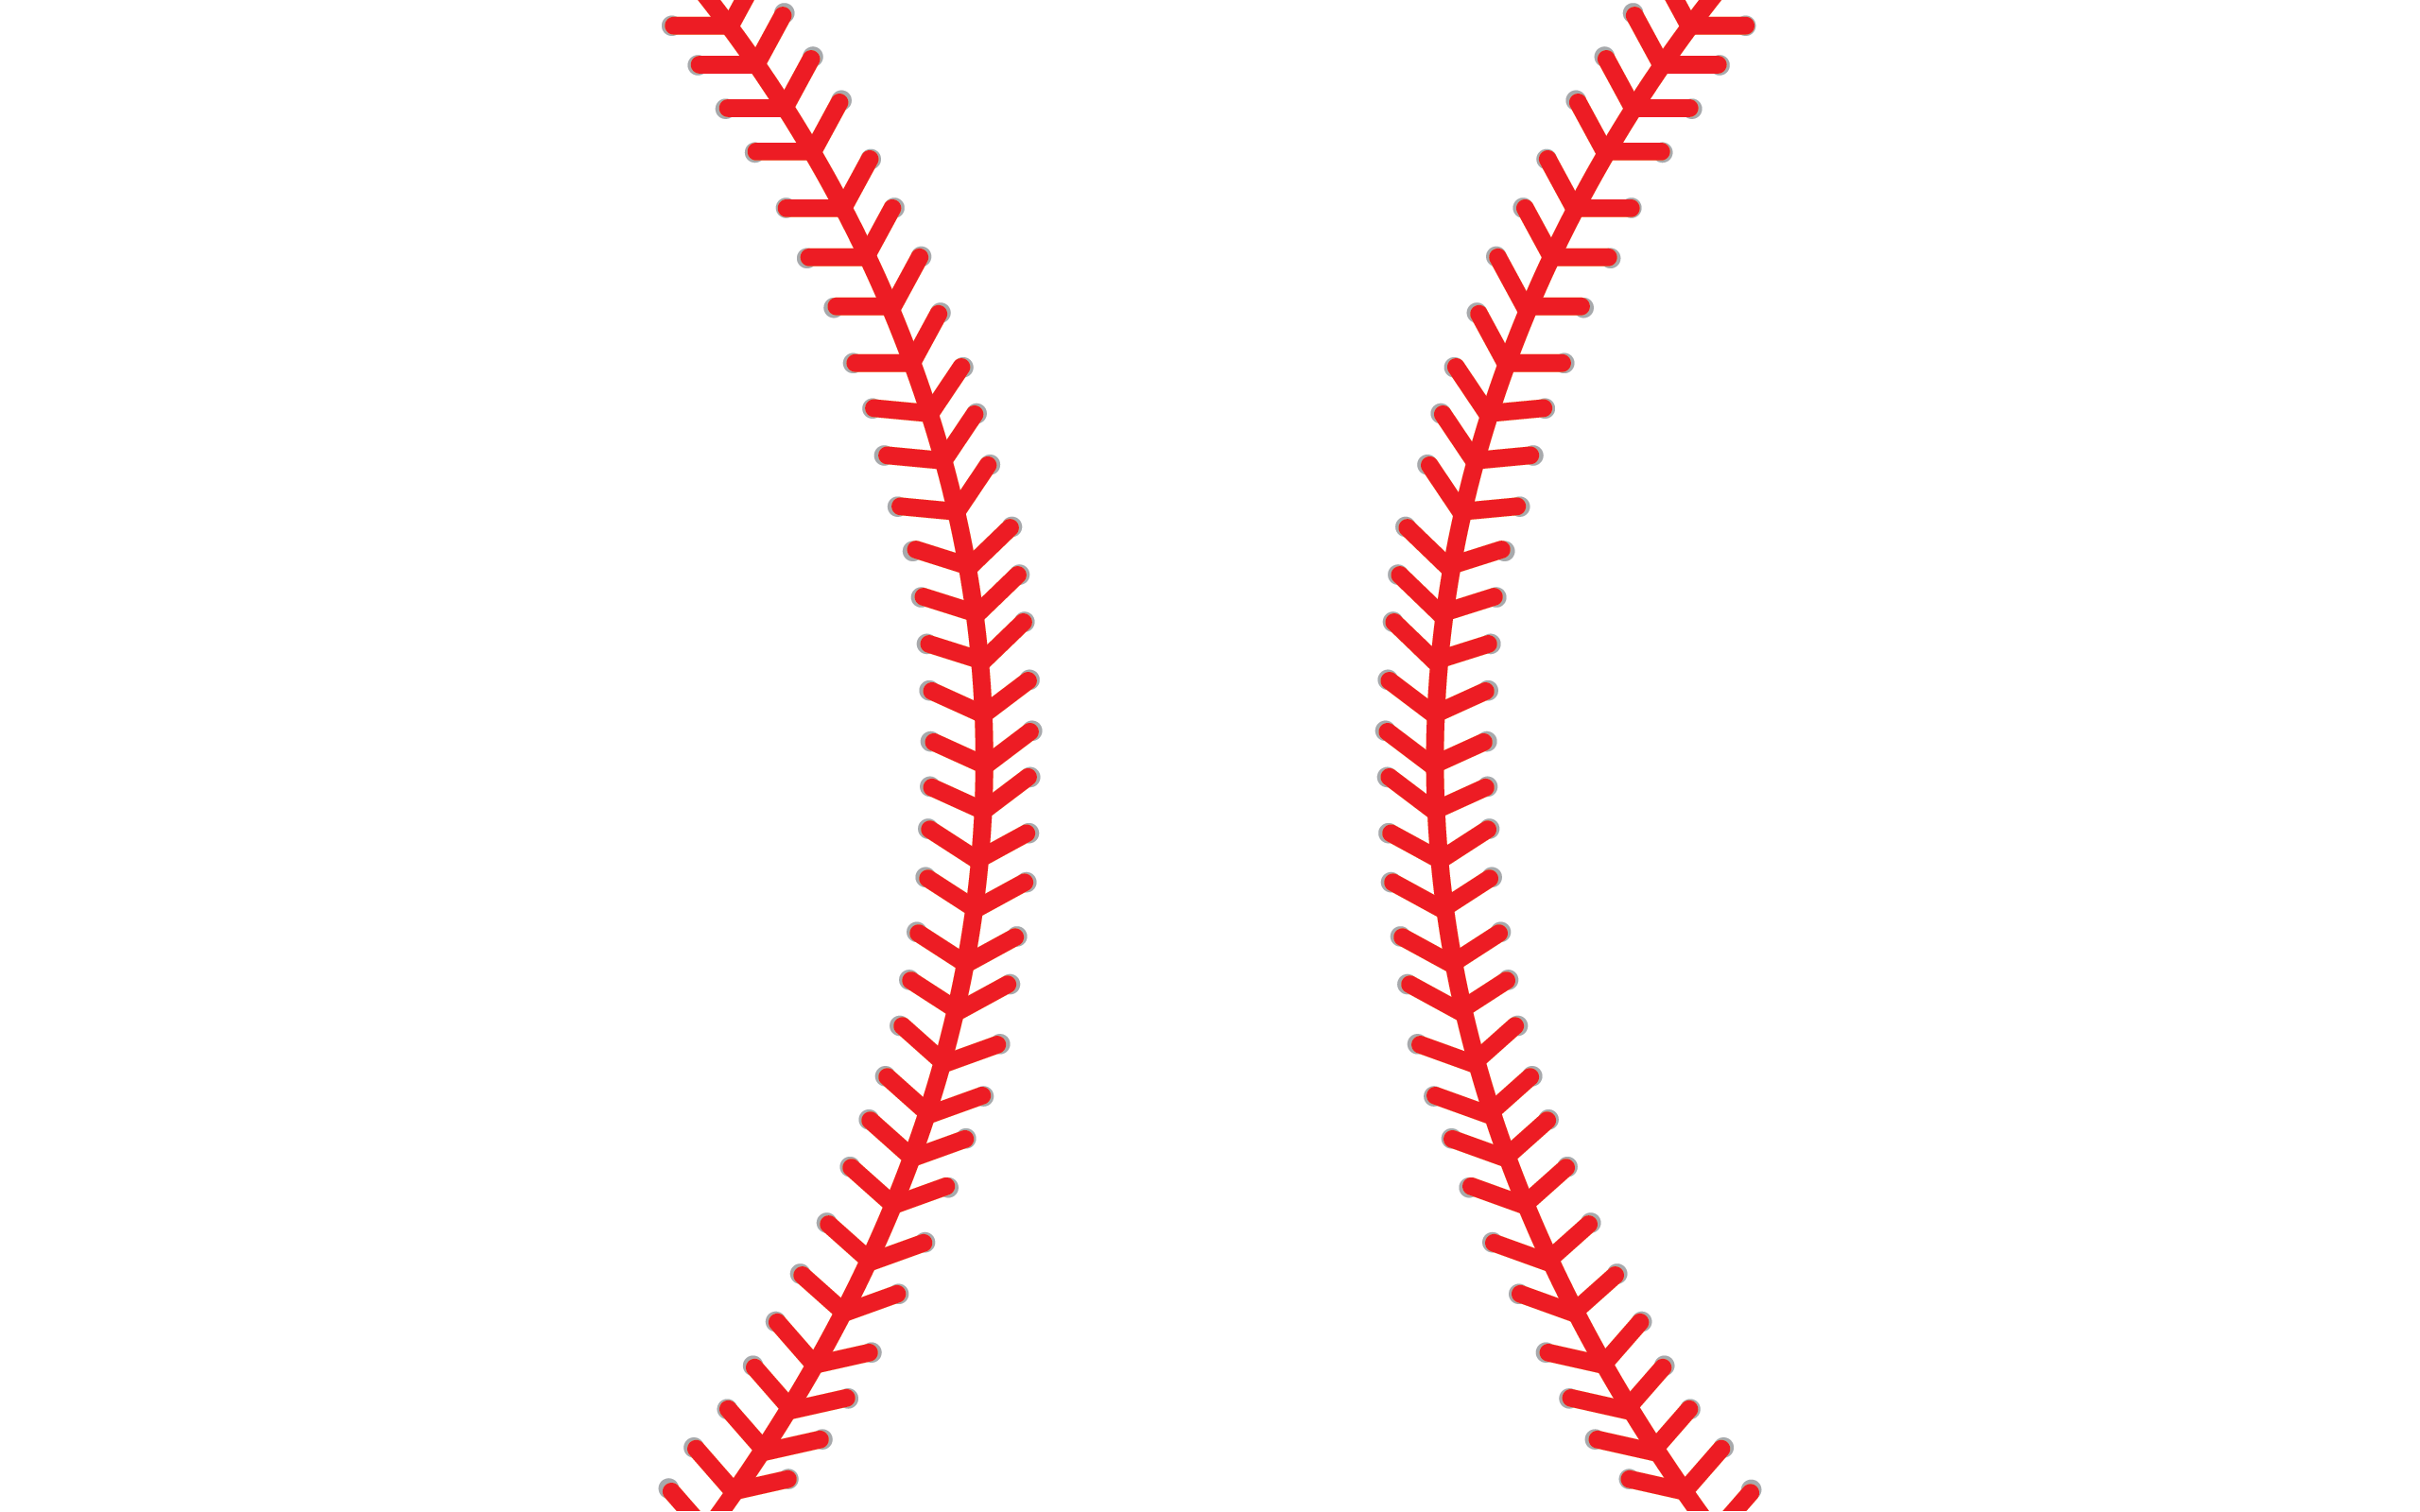 Baseball Stitches Clipart Google Search Baseball Stitch Baseball Printables Vacation Bible School